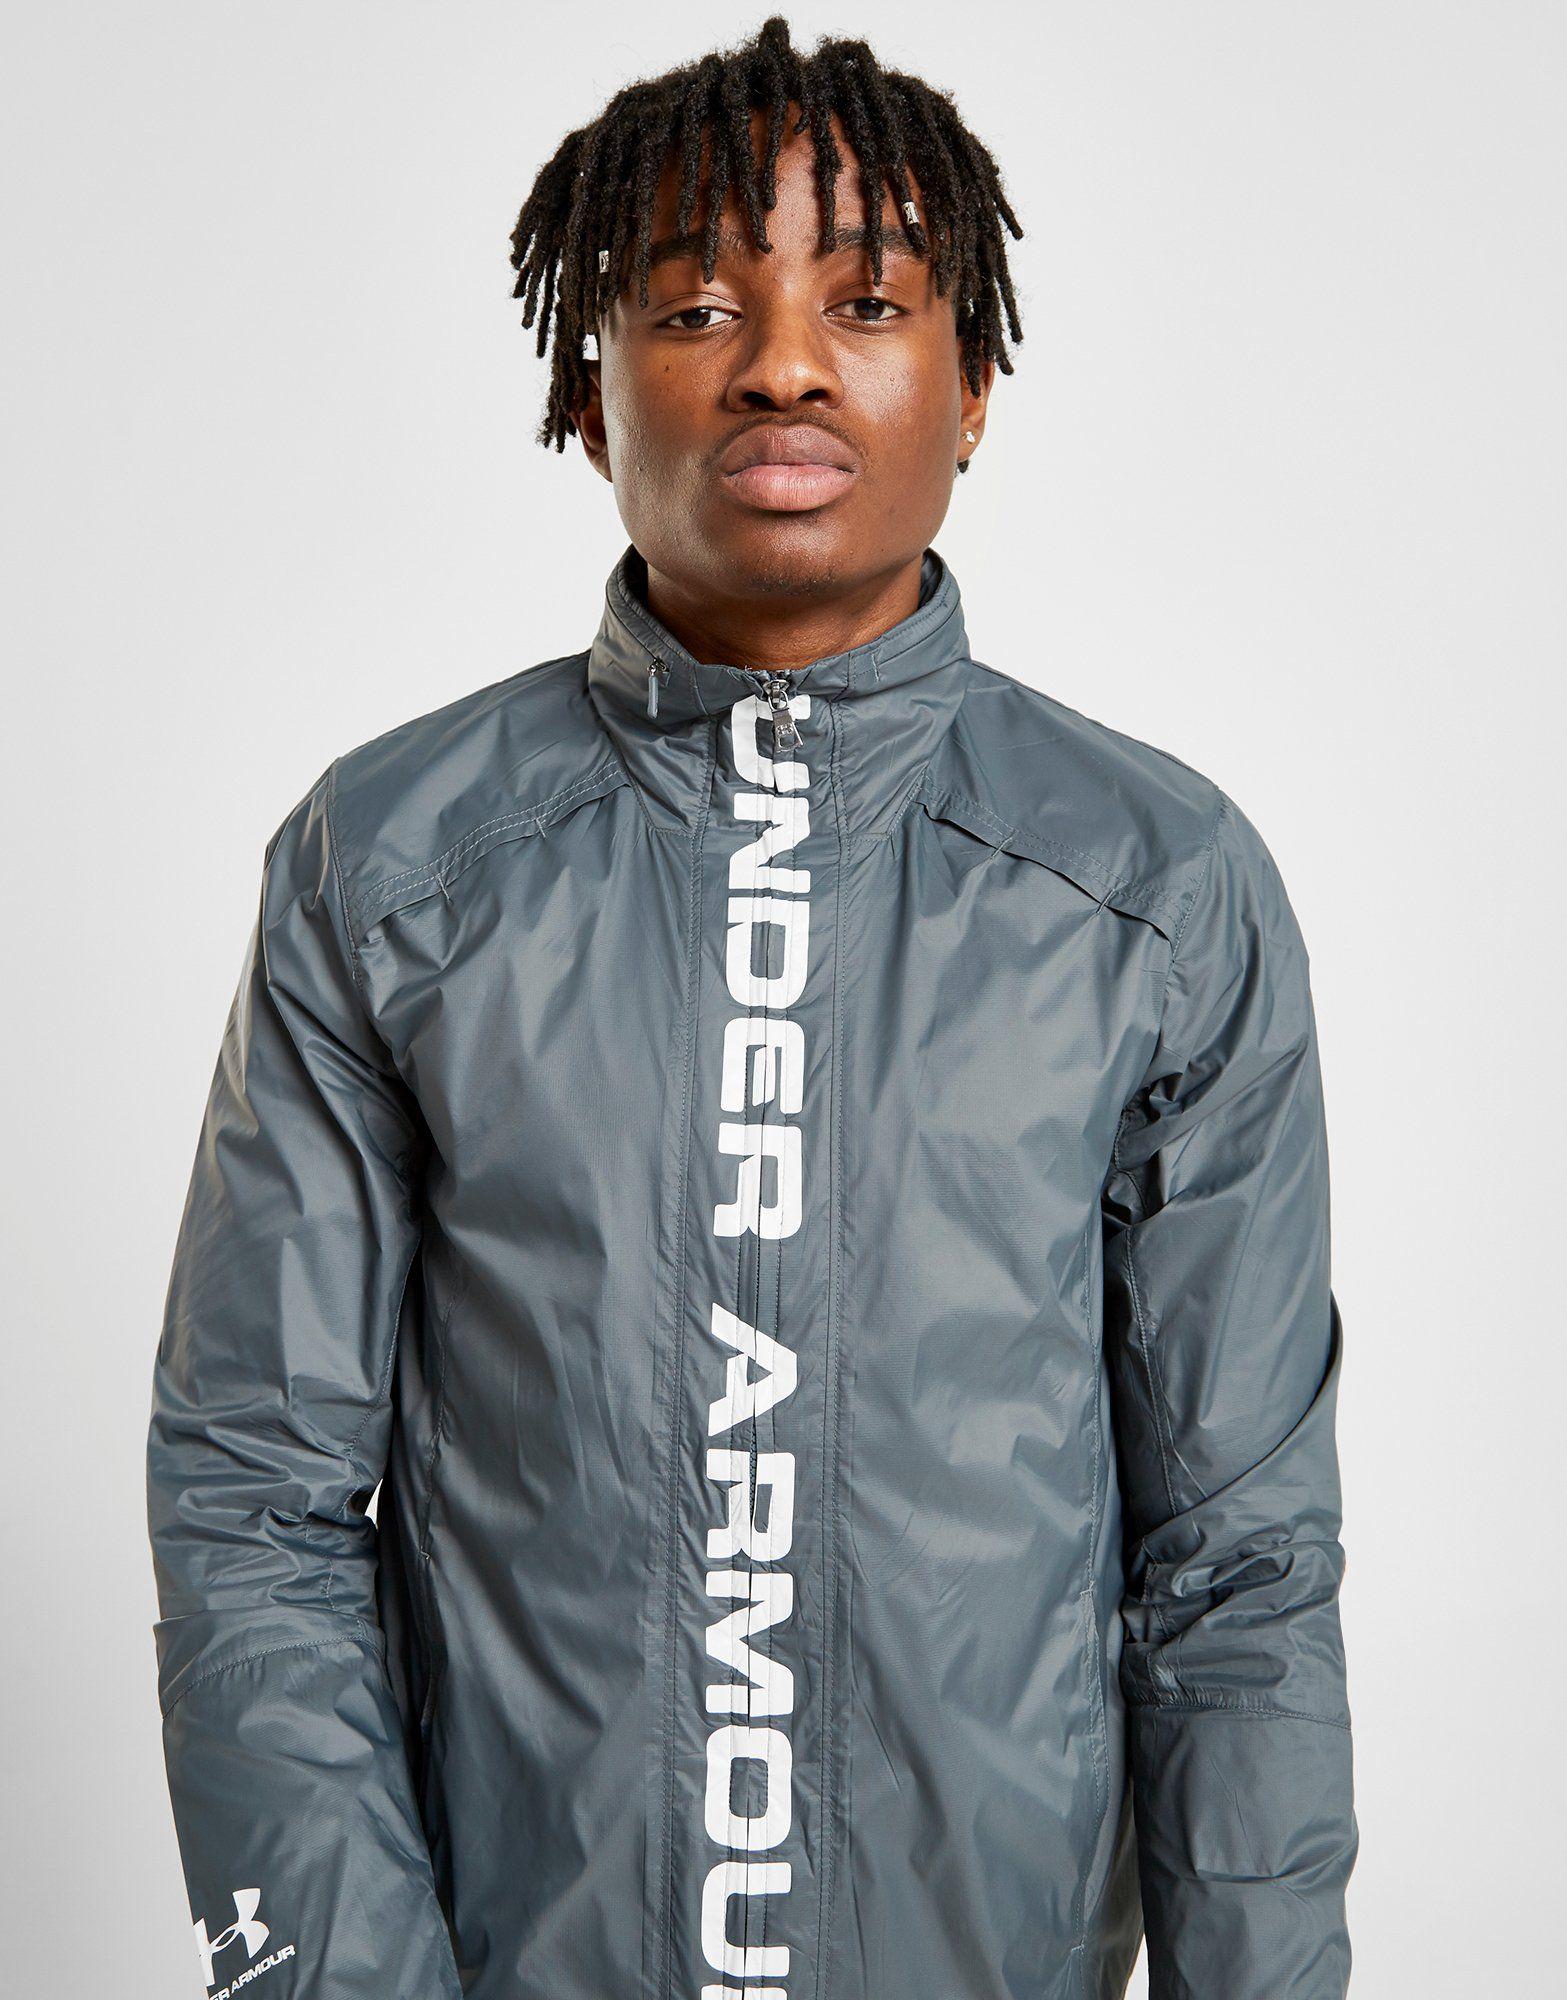 Under Armour Accelerated Wordmark Jacket